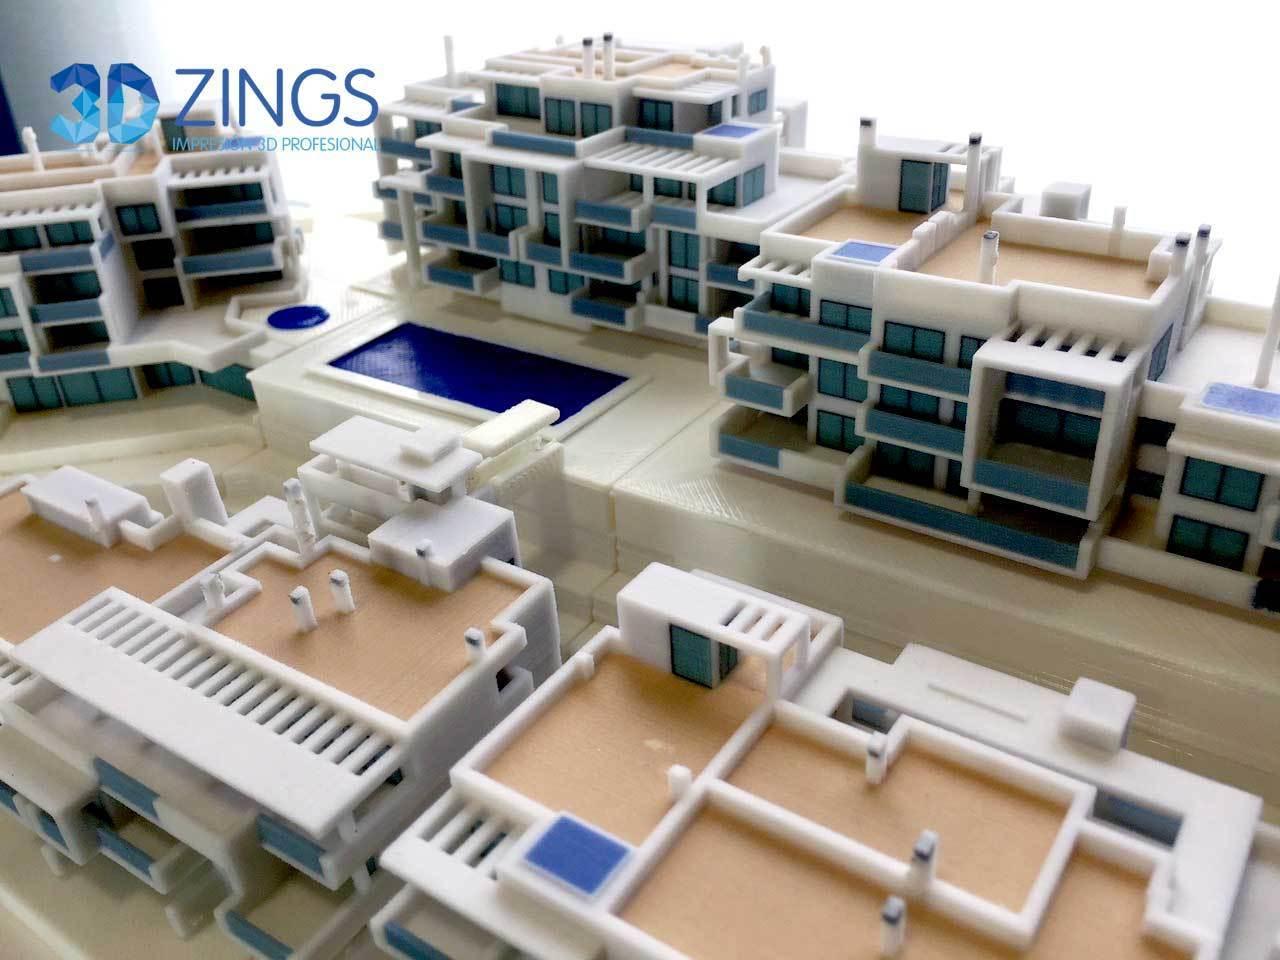 Segunda vista de la maqueta de arquitectura